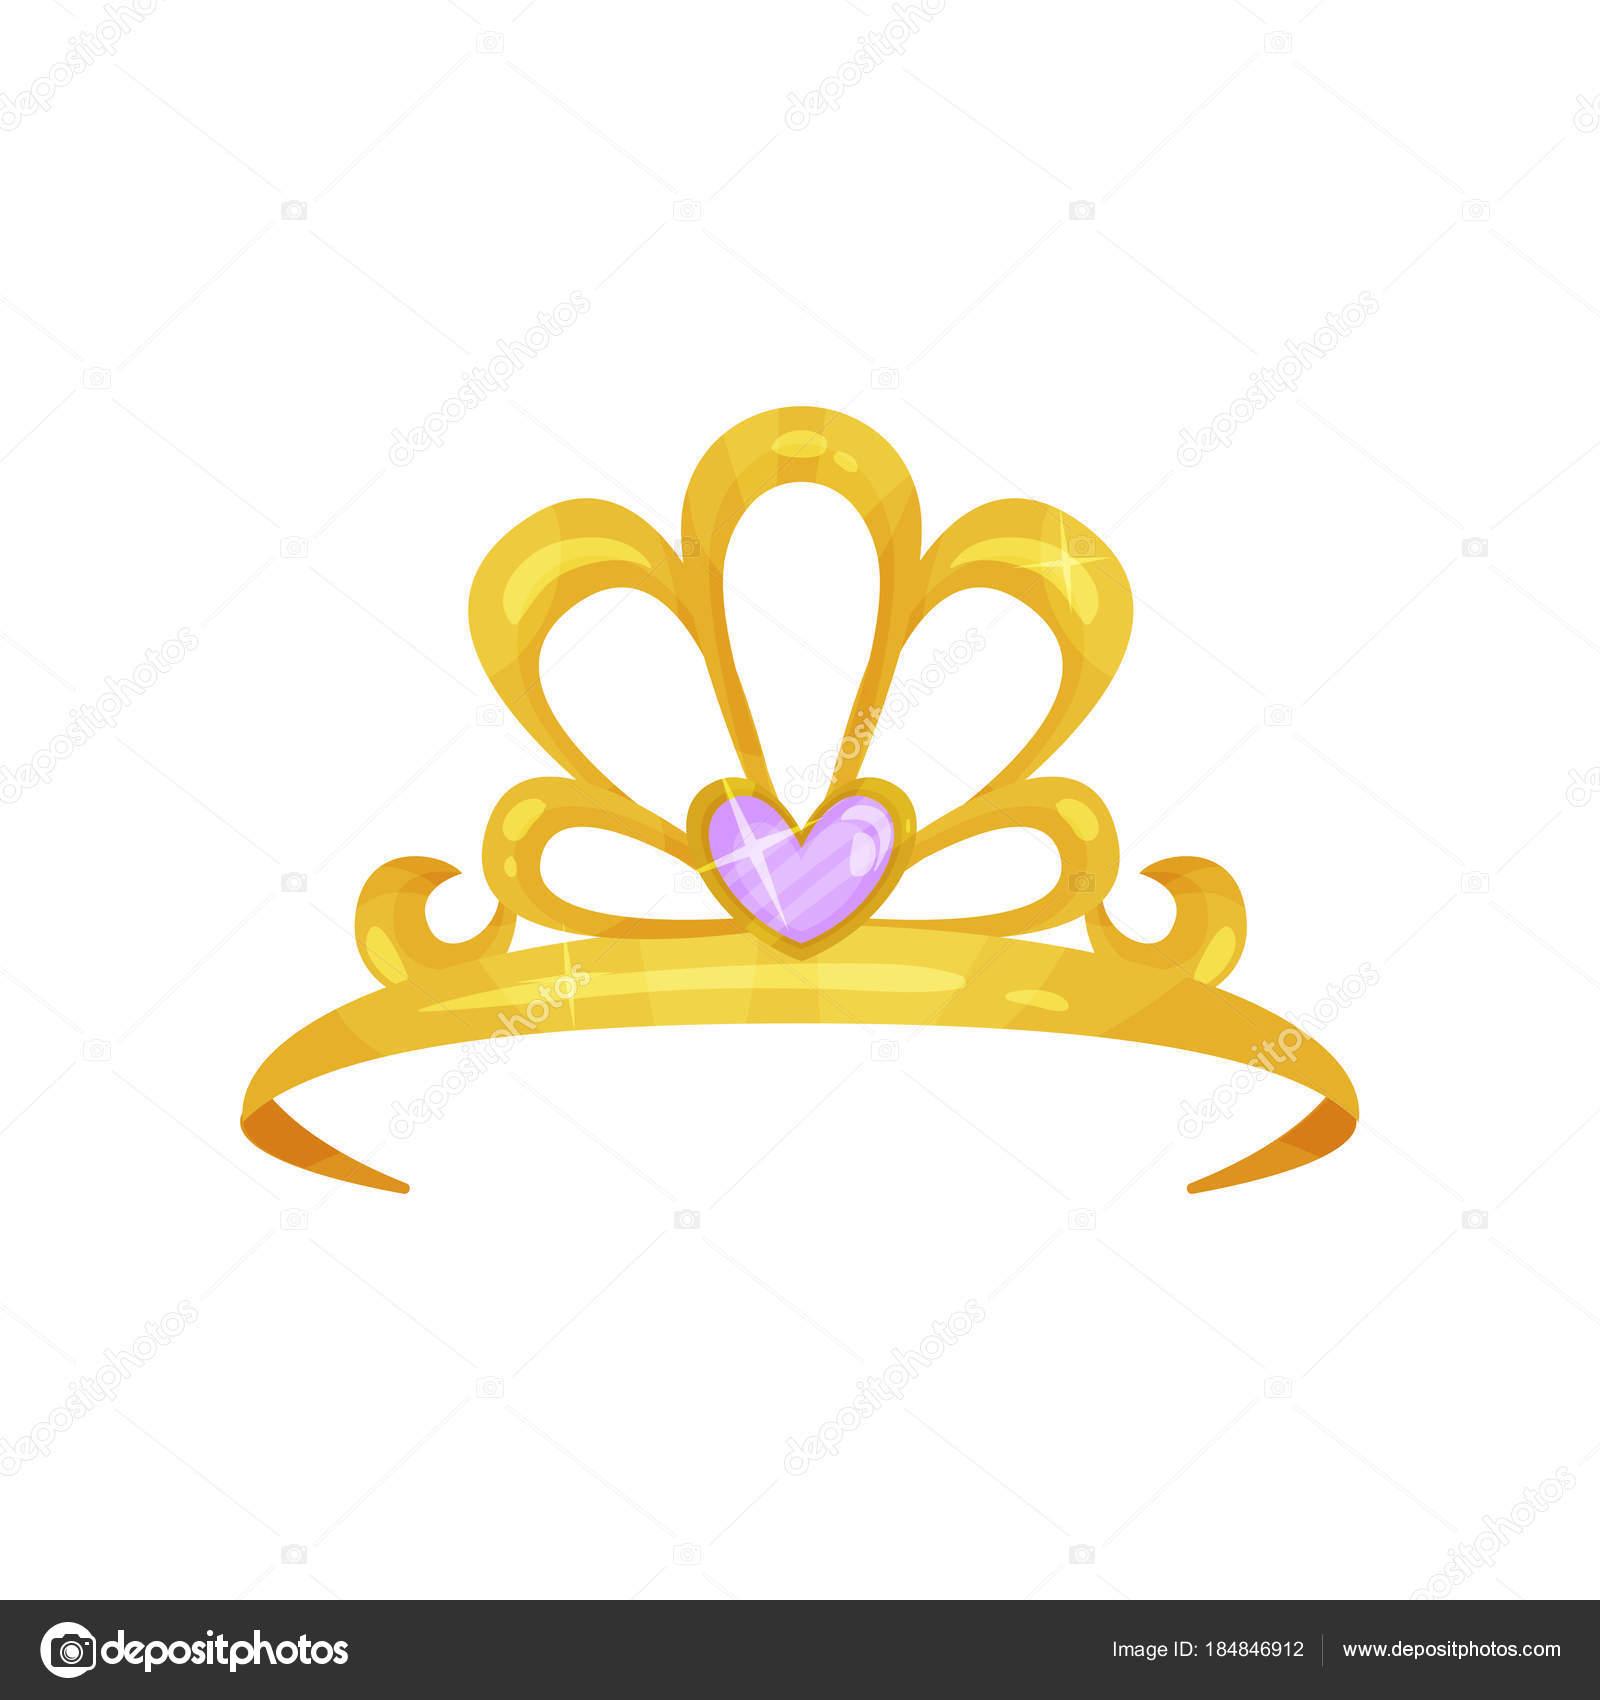 Dibujos Coronas De Reina Corona Reina Oro Con Piedra Semipreciosa